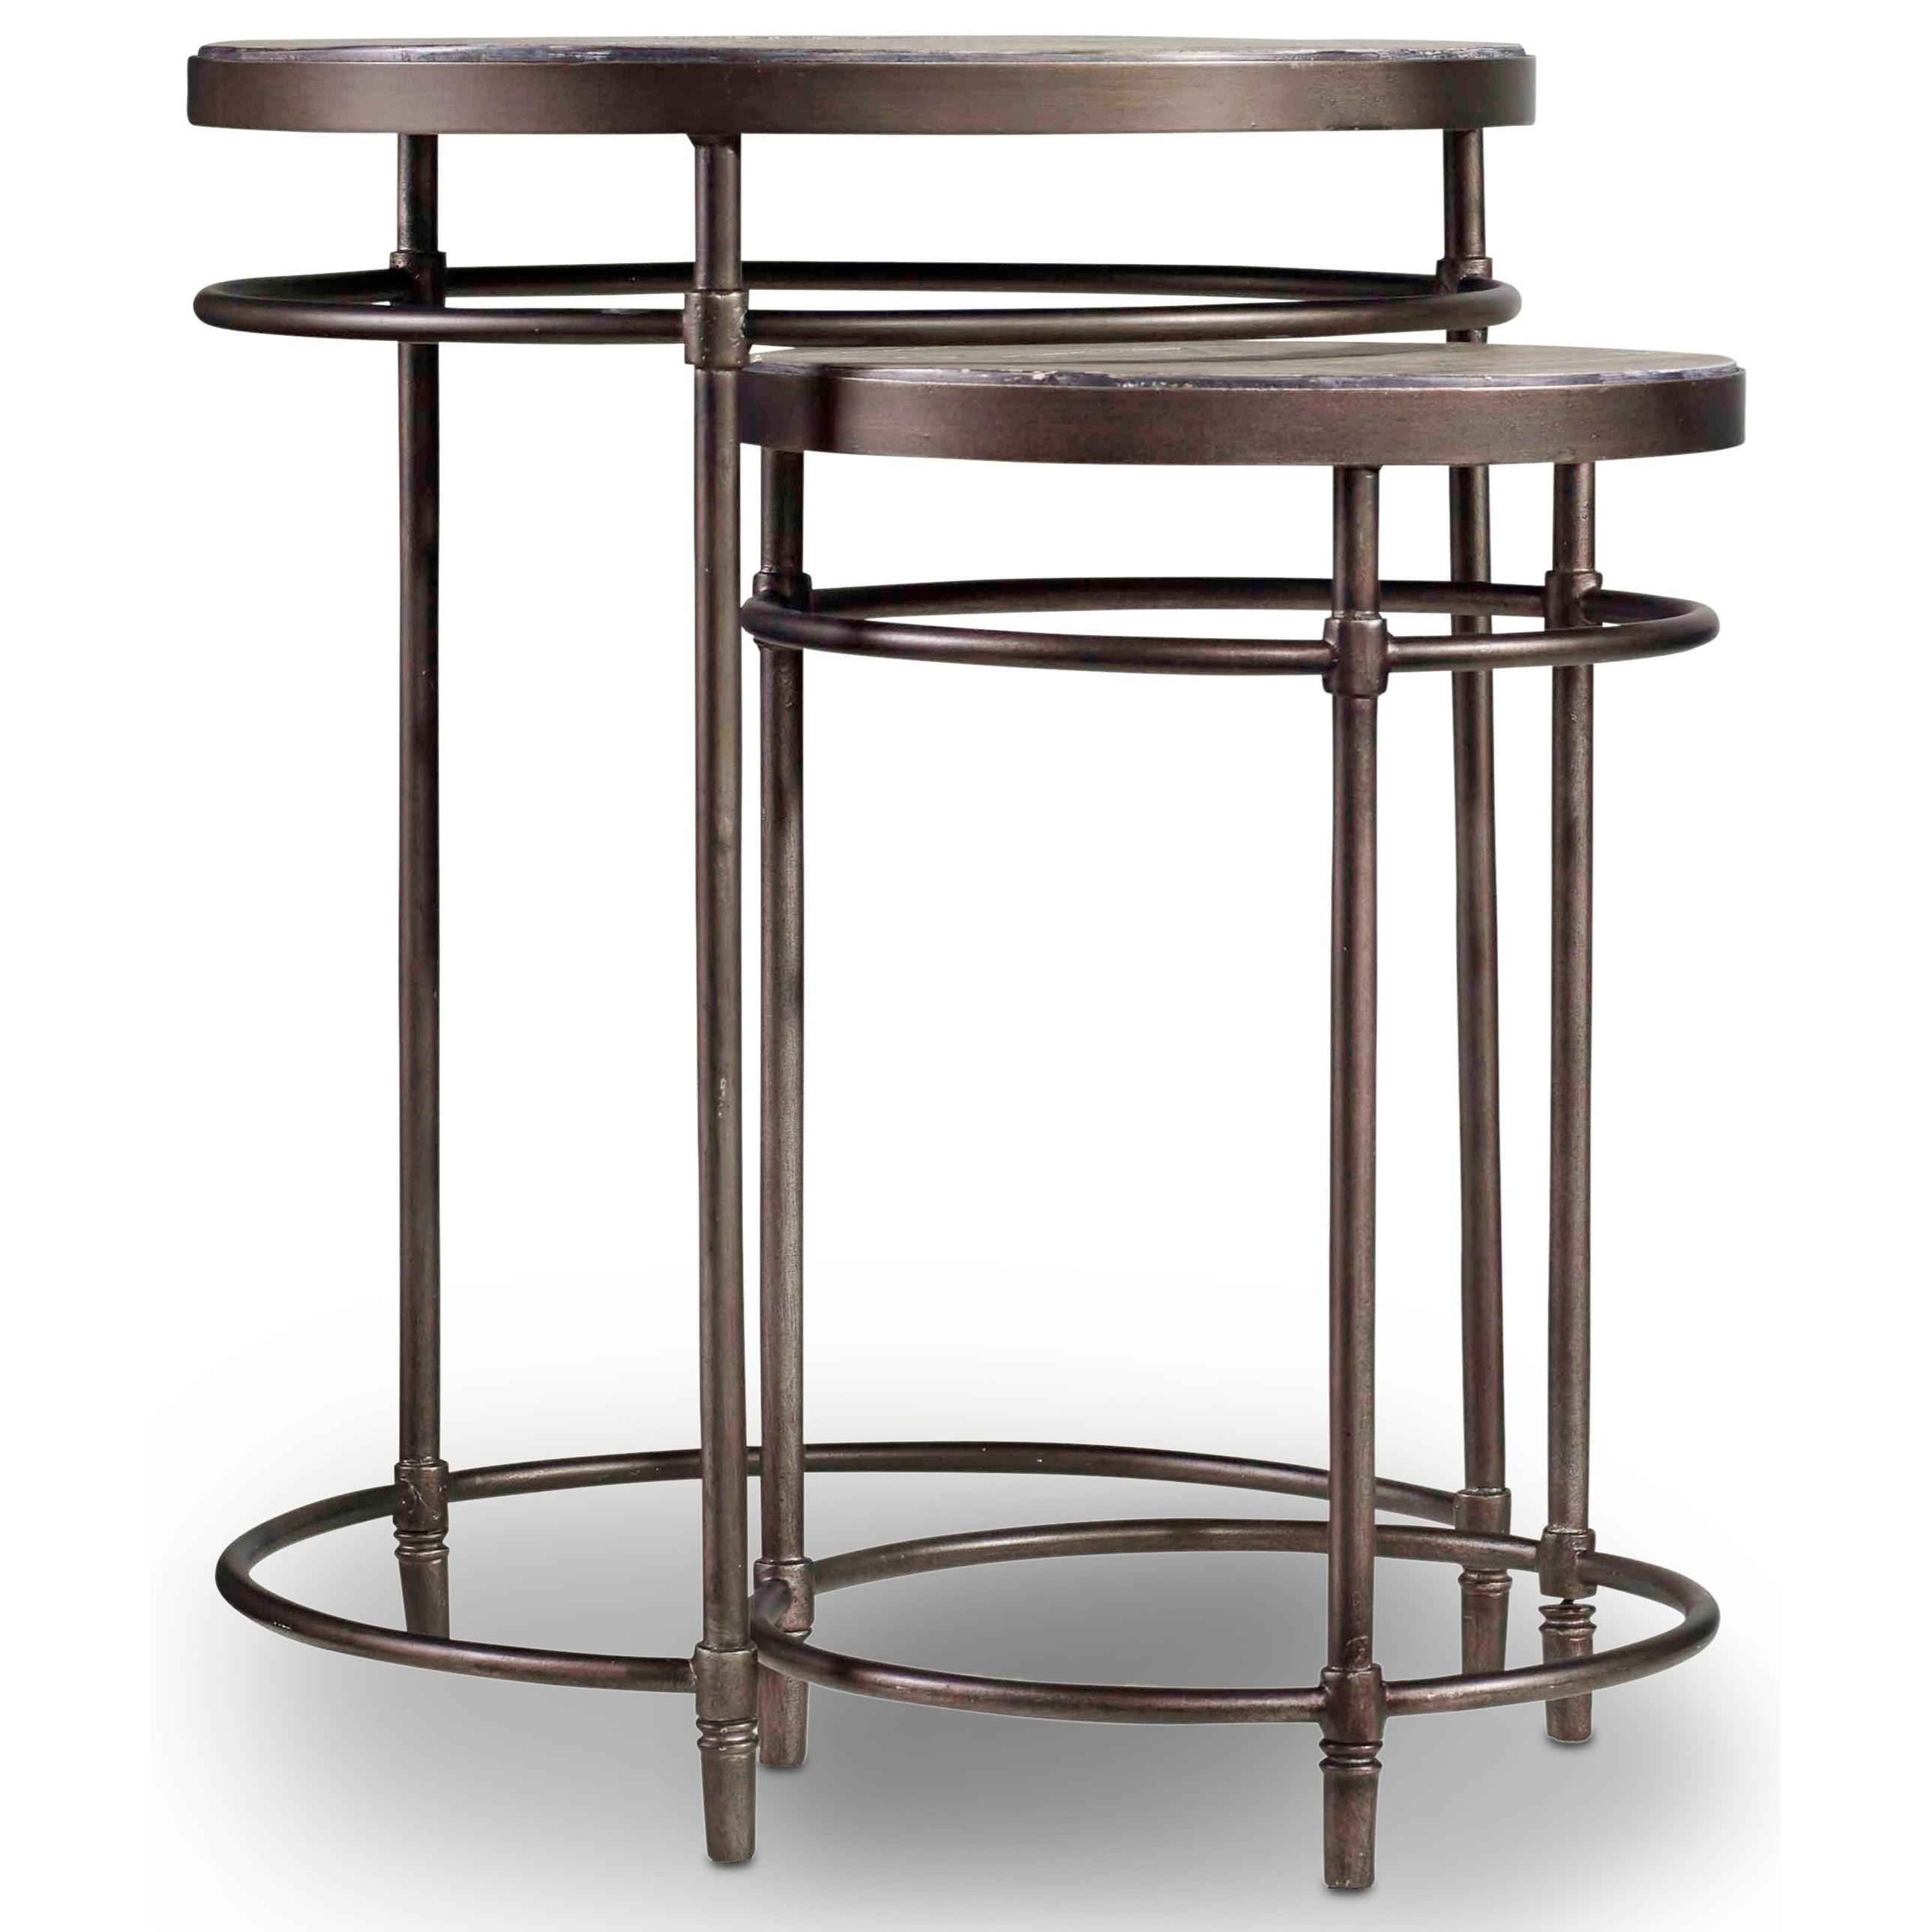 Hooker Furniture Saint Armand Nest Of Tables With Metal Base   Pedigo  Furniture   End Tables